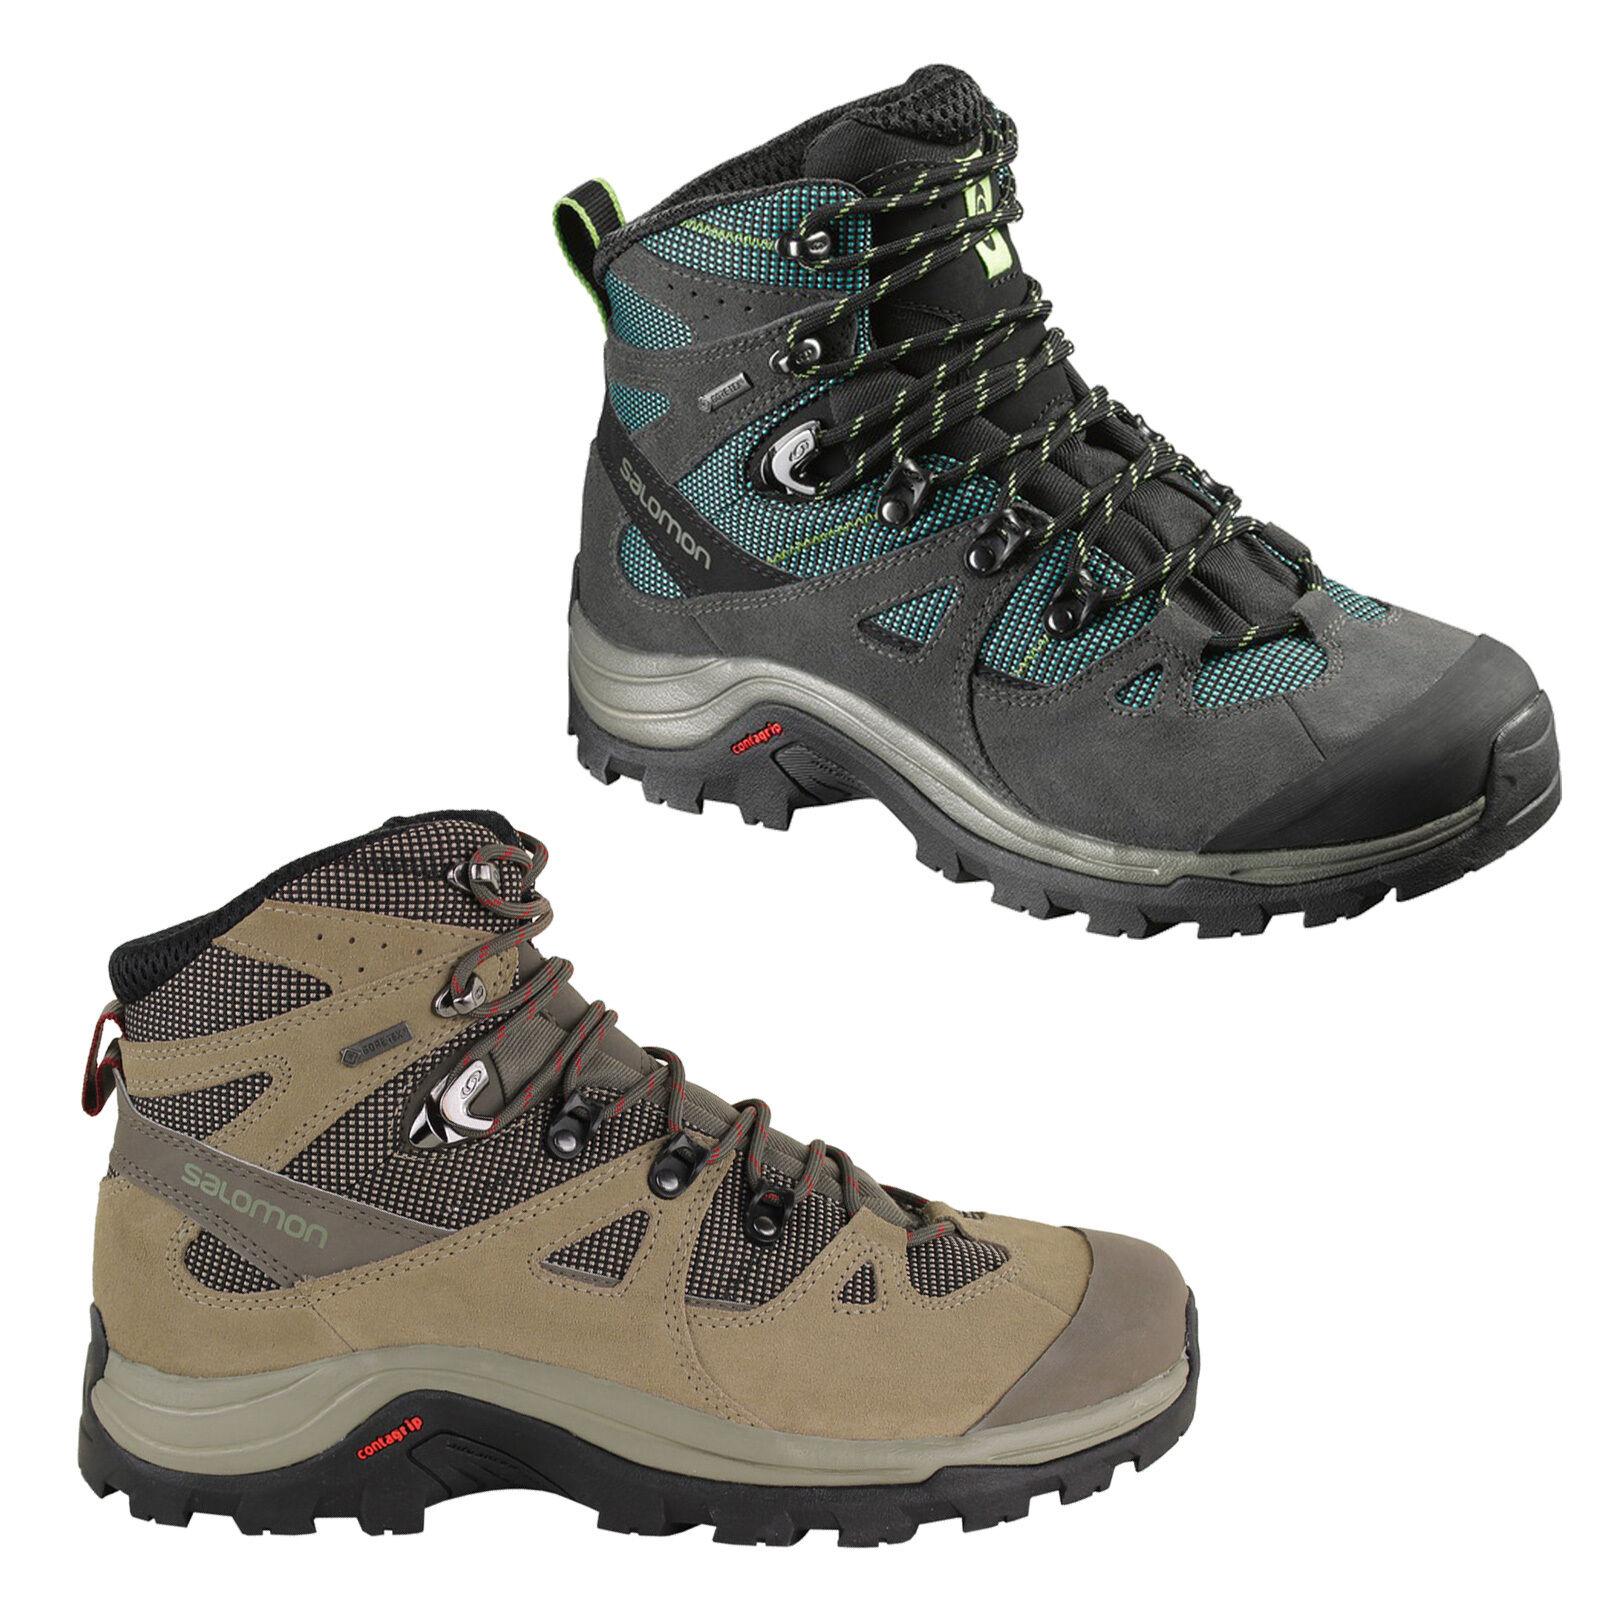 Salomon Discovery GTX DaSie-Schuhe Trekkingschuhe Wanderschuhe OutdoorStiefel